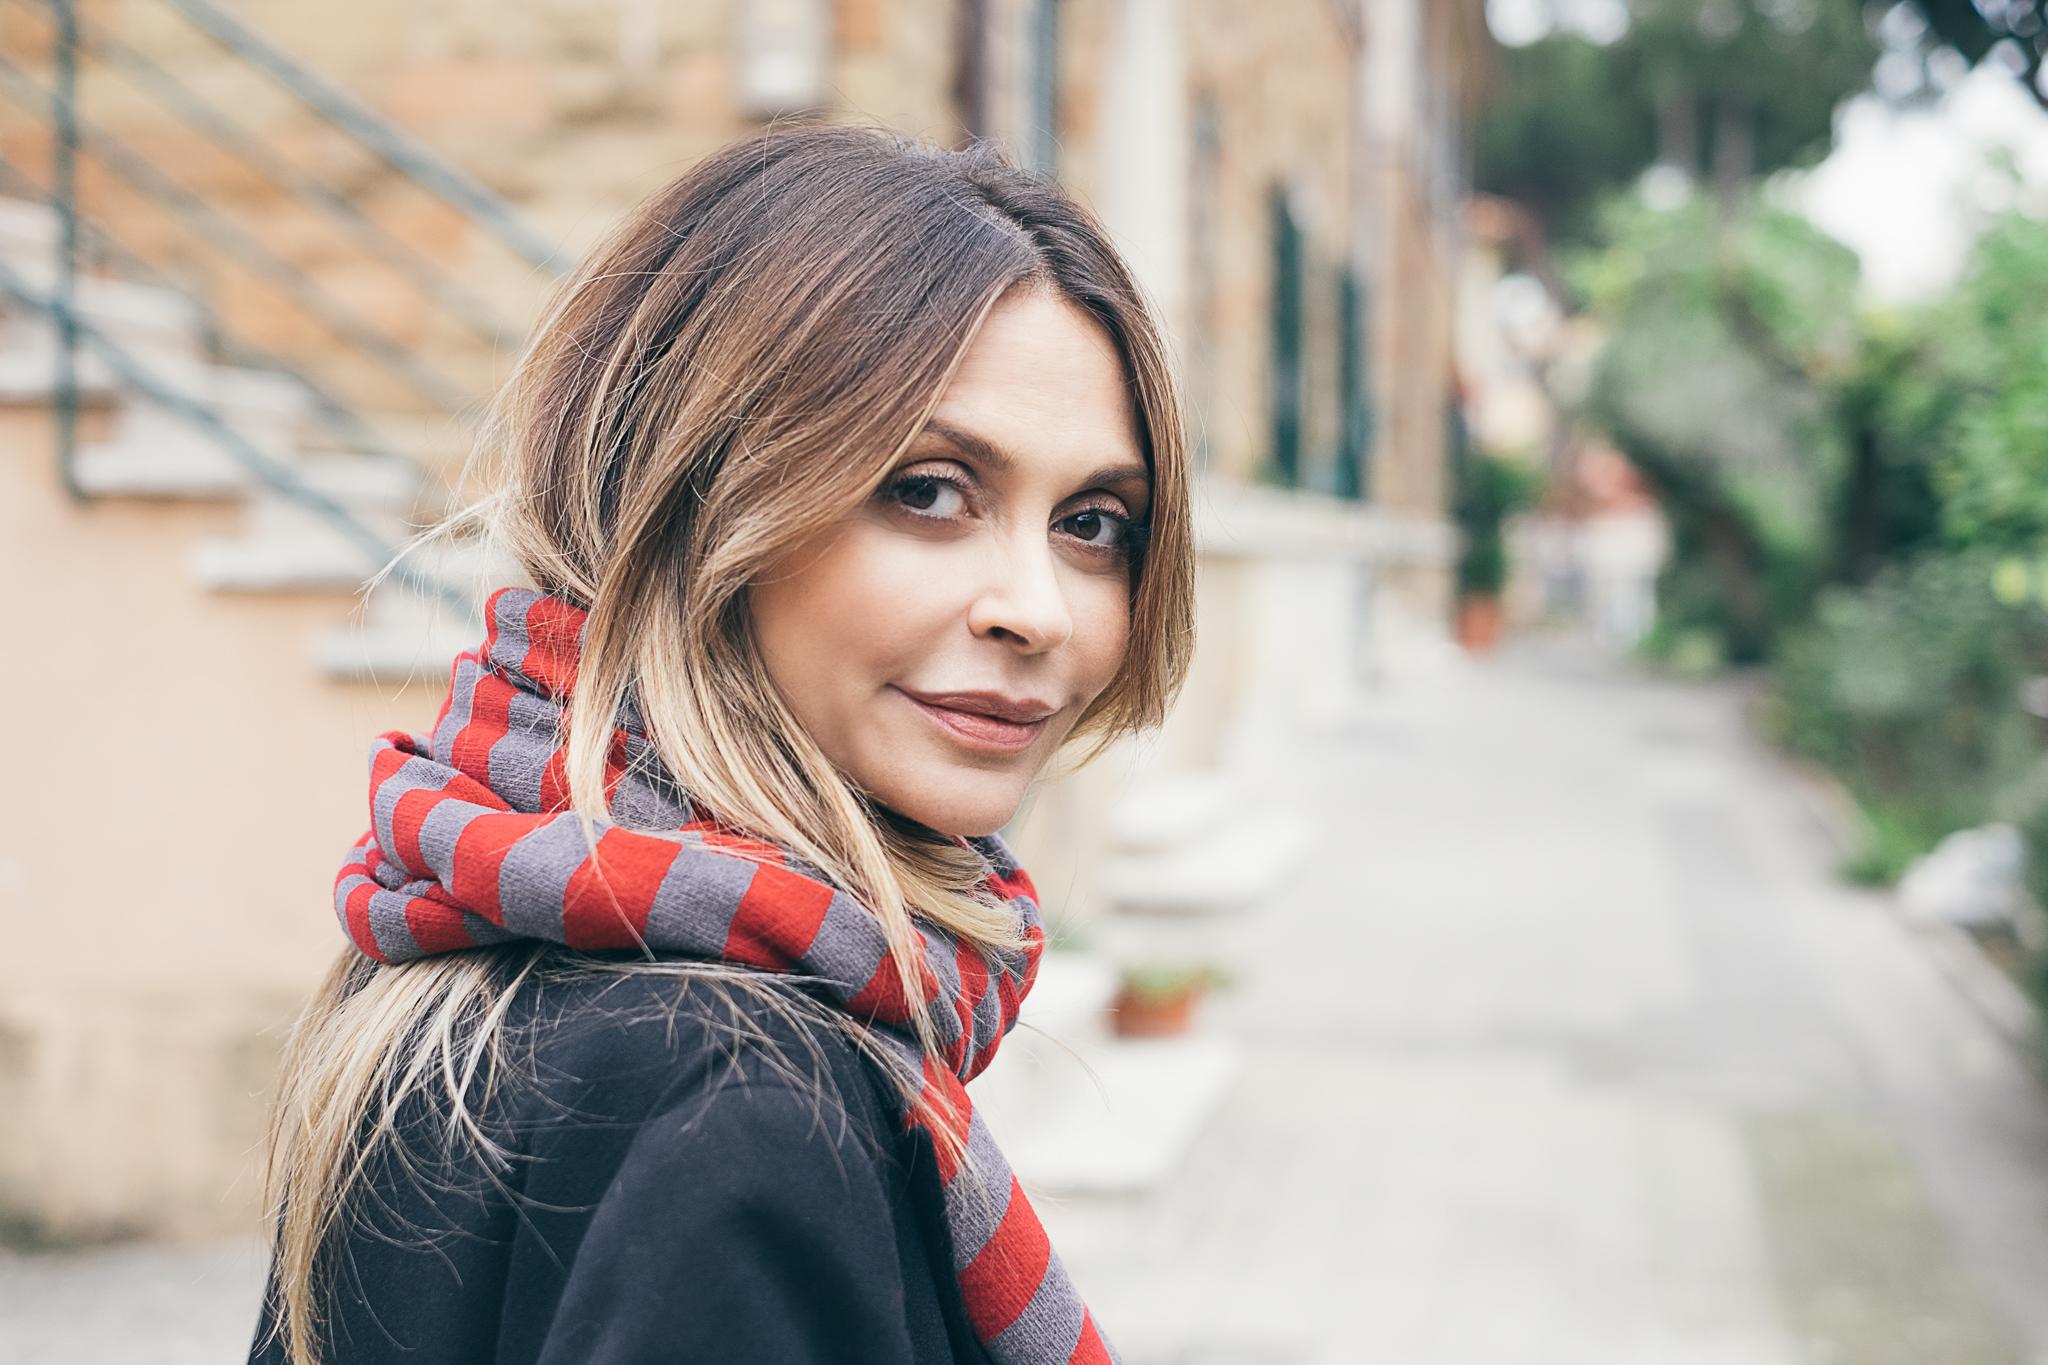 Ritratti_Elda Alvigini2017 (6)